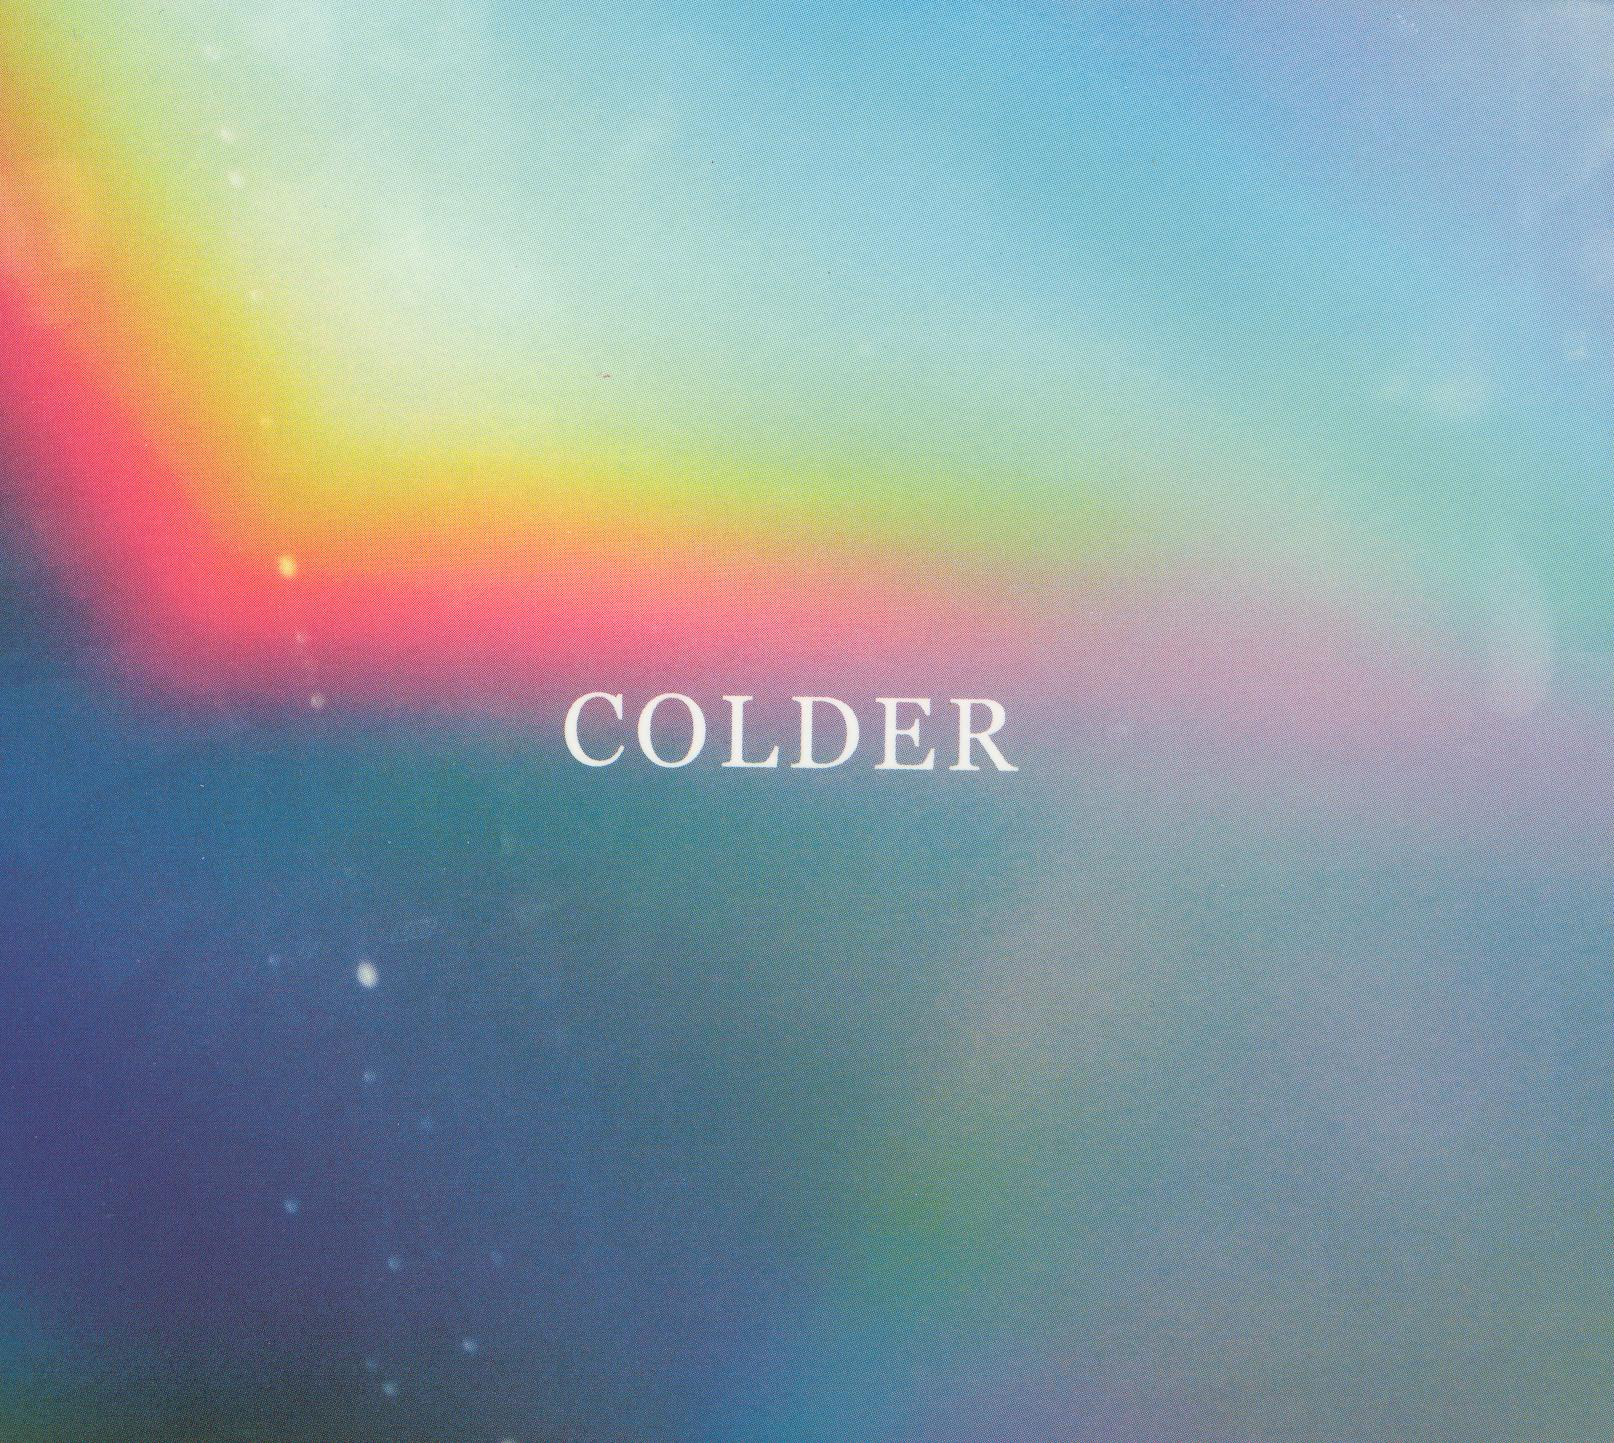 Colder: Again